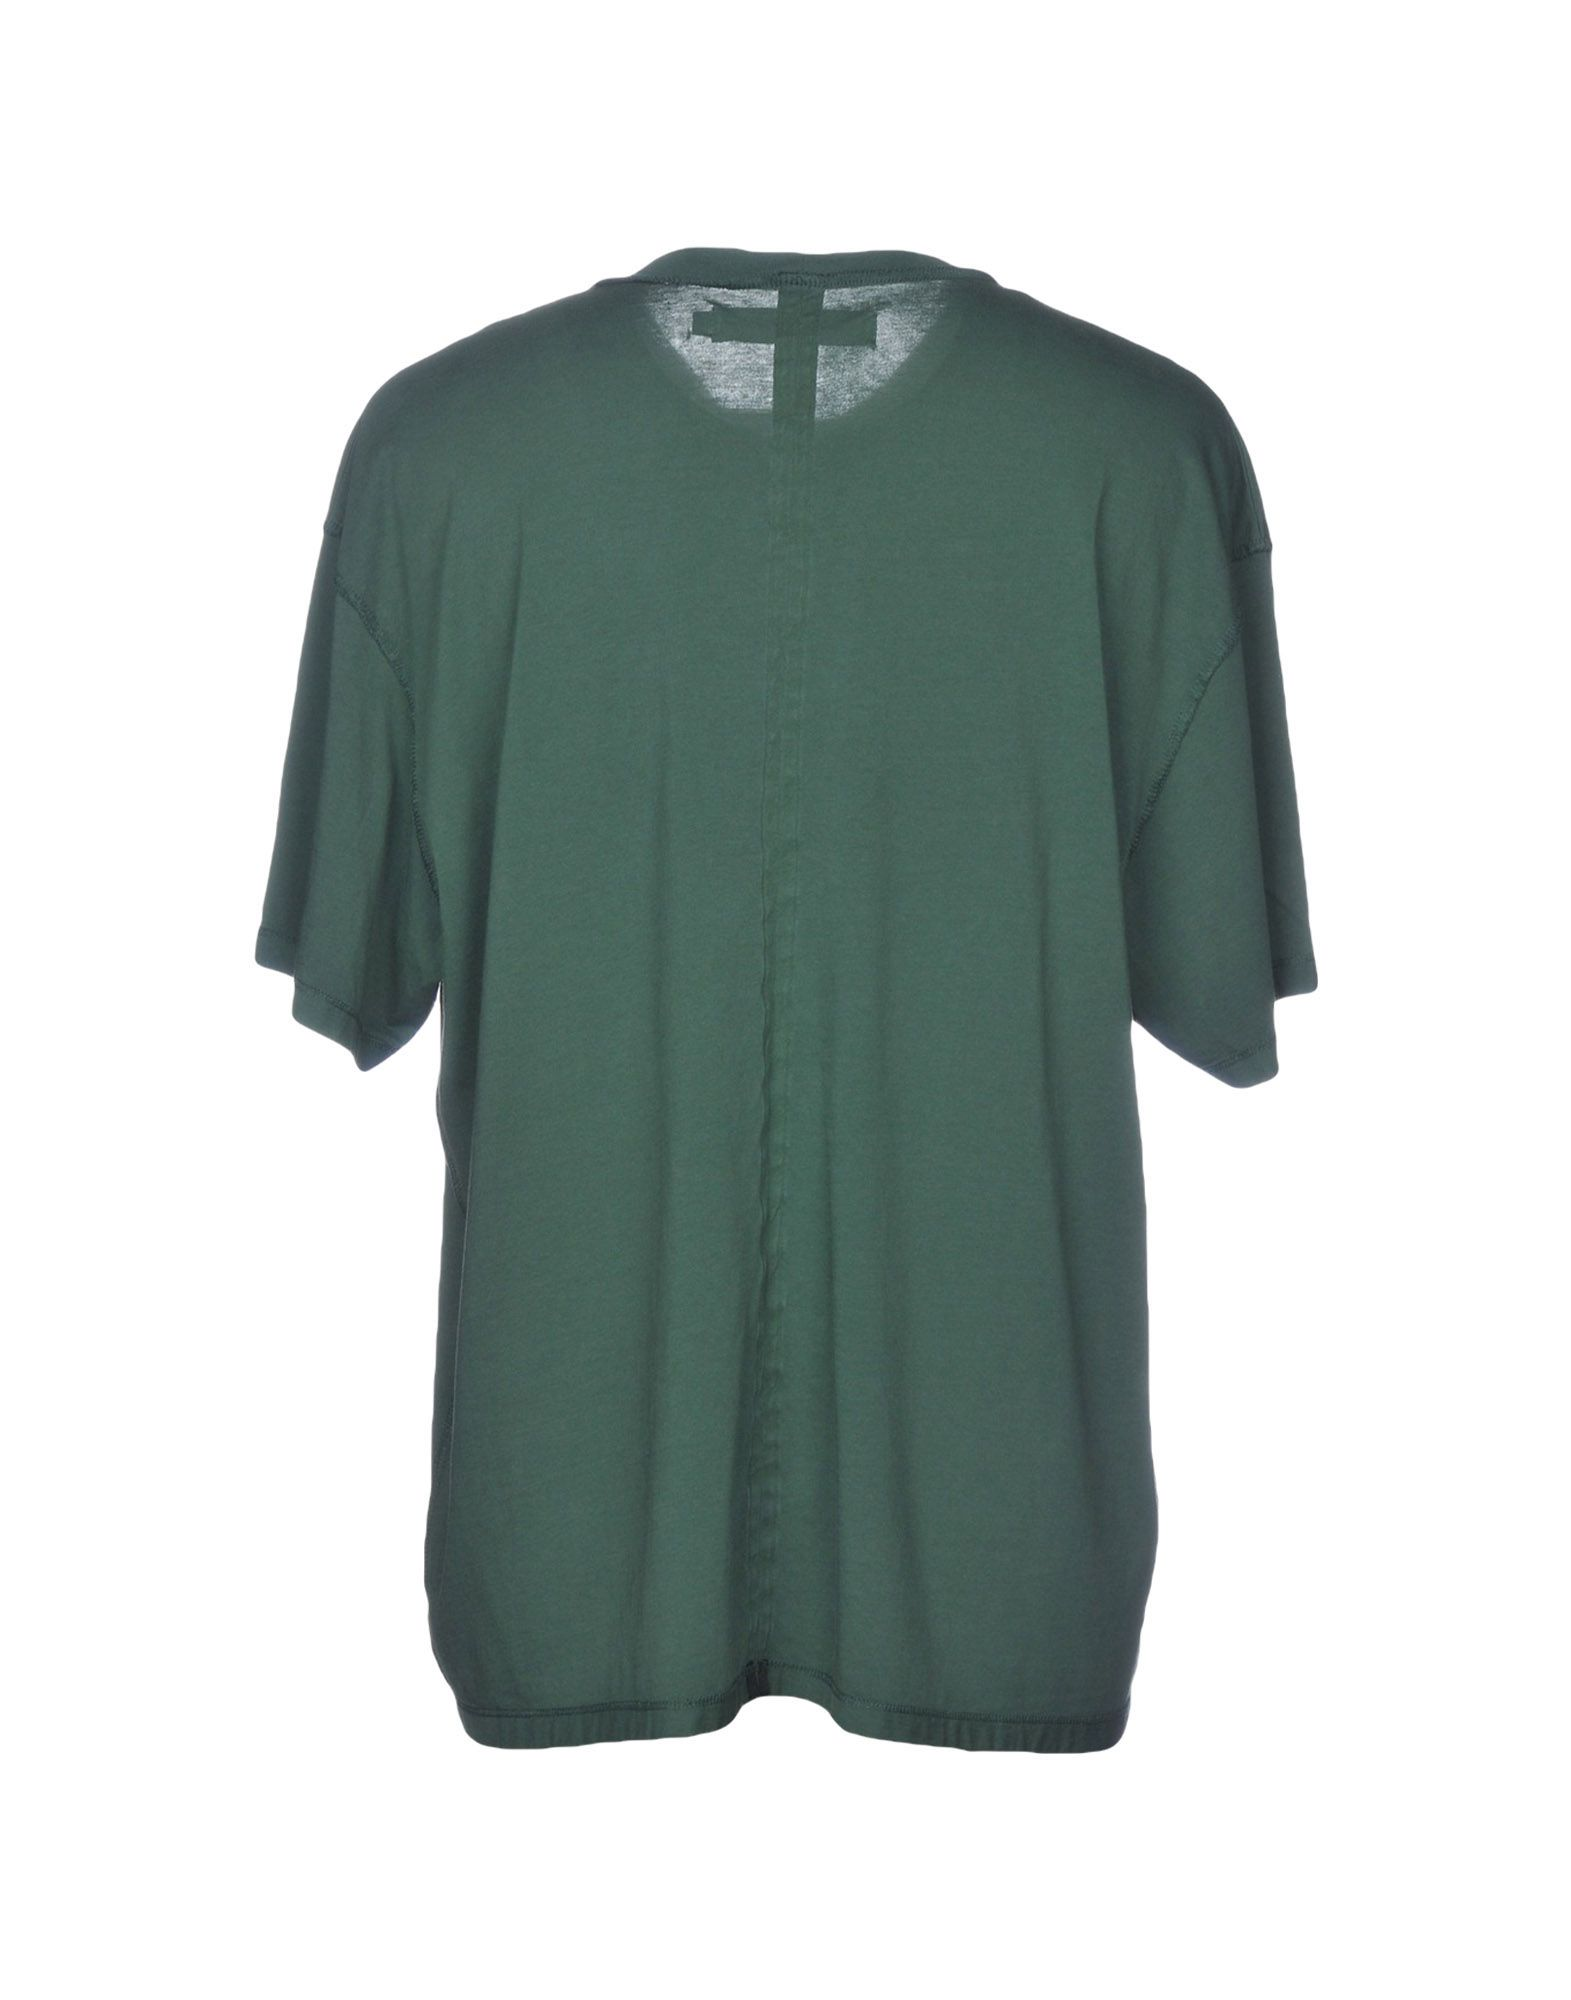 A buon mercato A buon mercato T-Shirt Uomo Mя.Completely Uomo T-Shirt - 12205756JC bbcb10